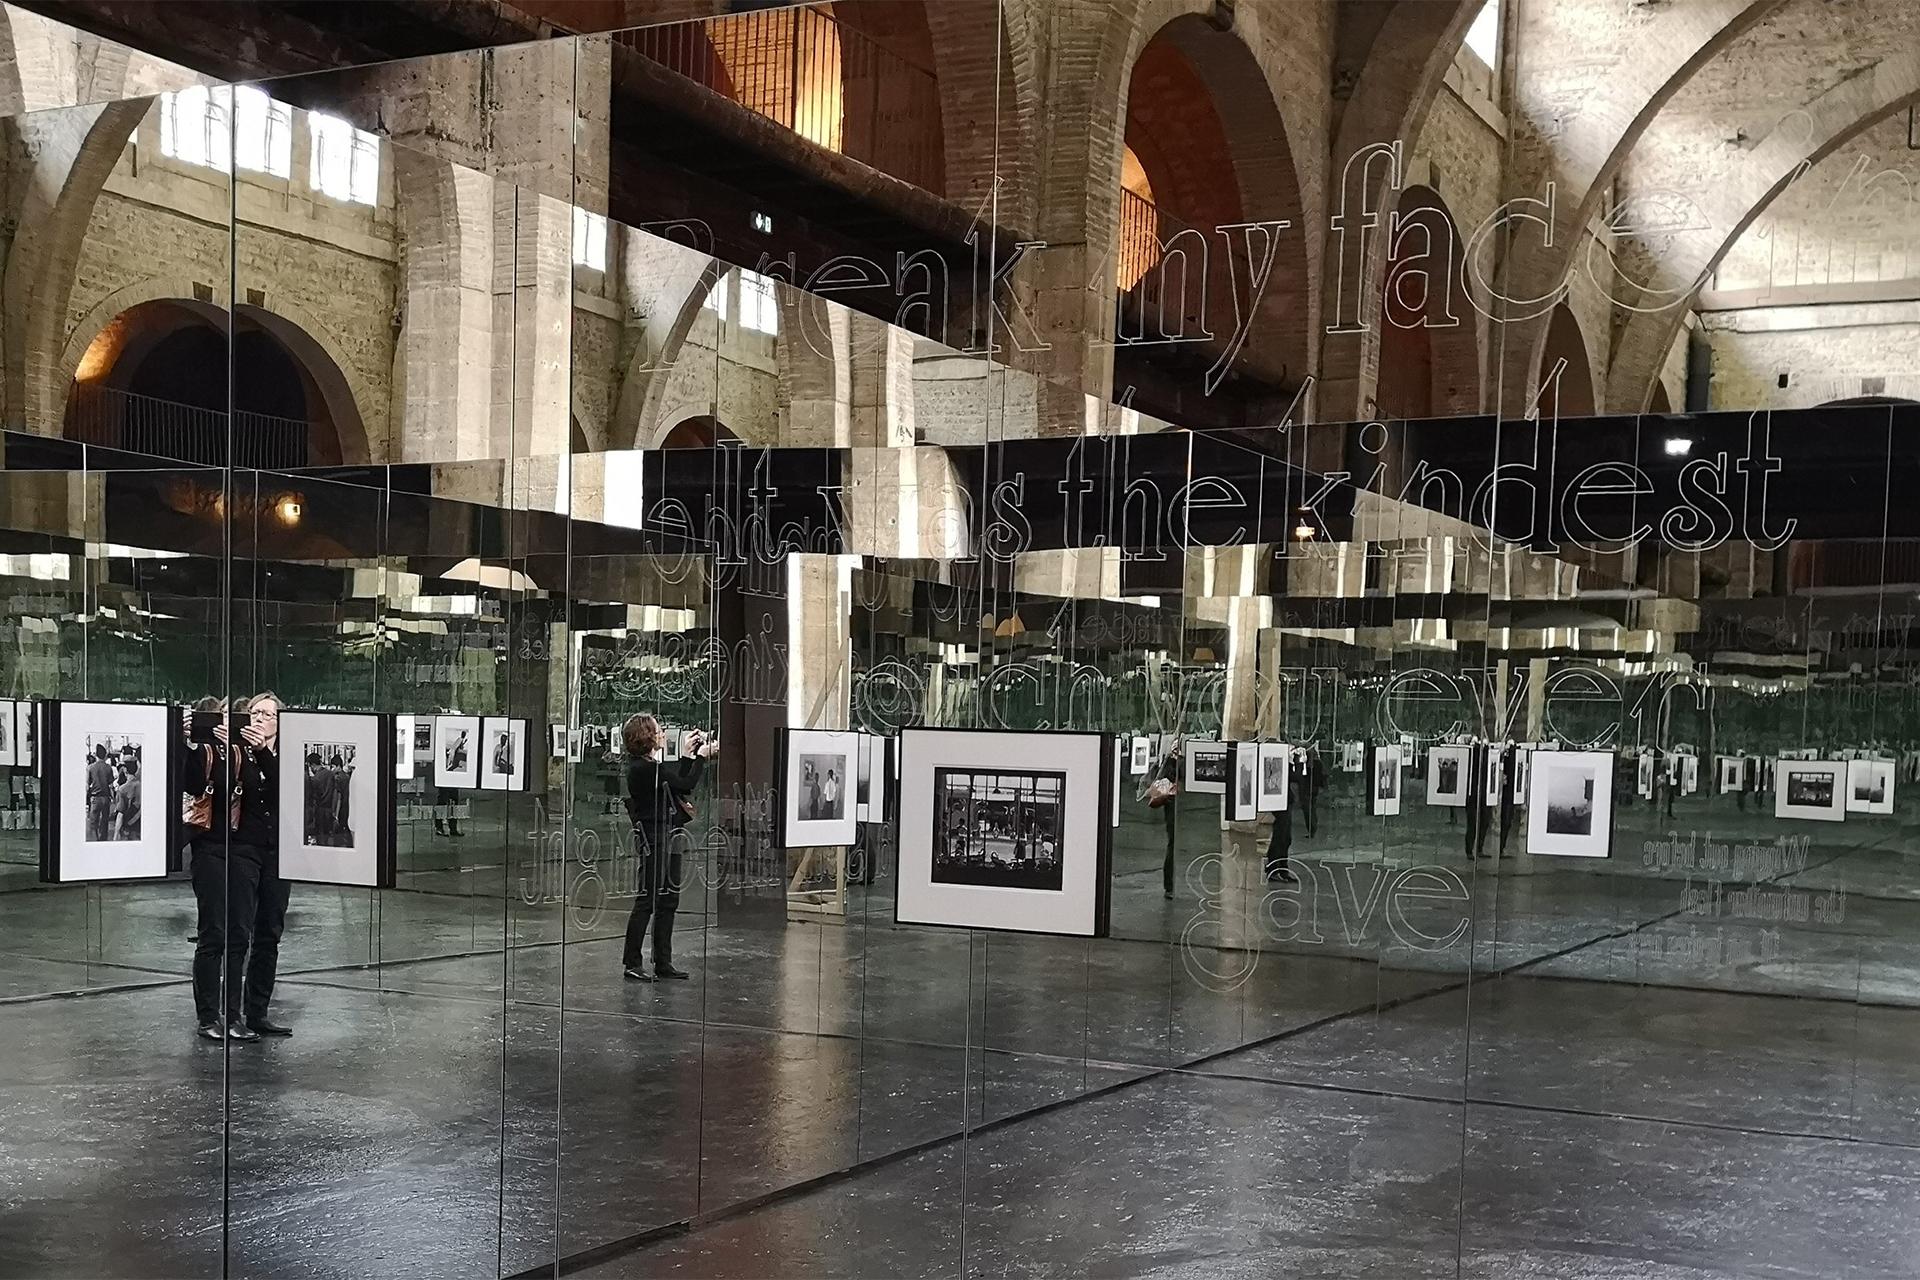 Paa udstilling i Bordeux